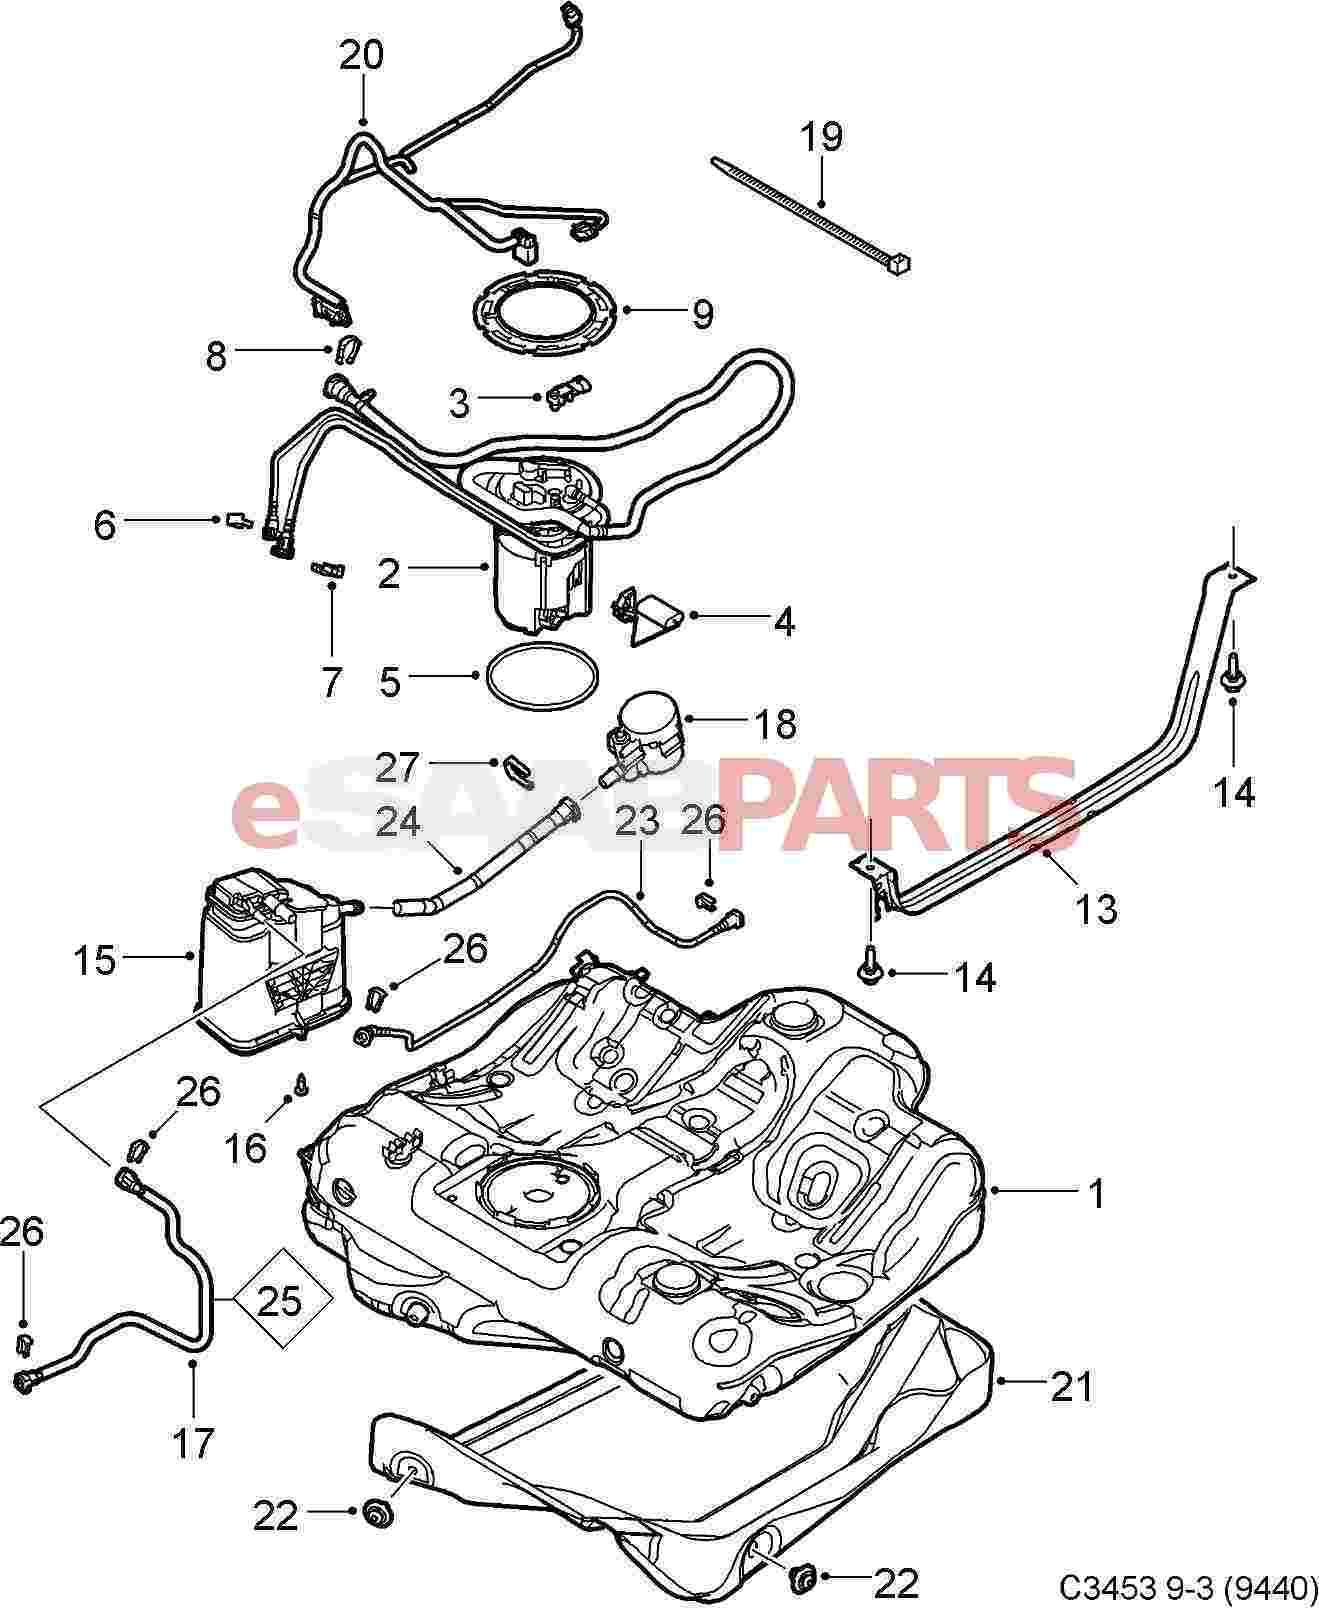 hight resolution of 99 saab 9 3 fuel tank diagram wiring diagram third level99 saab 9 3 fuel tank